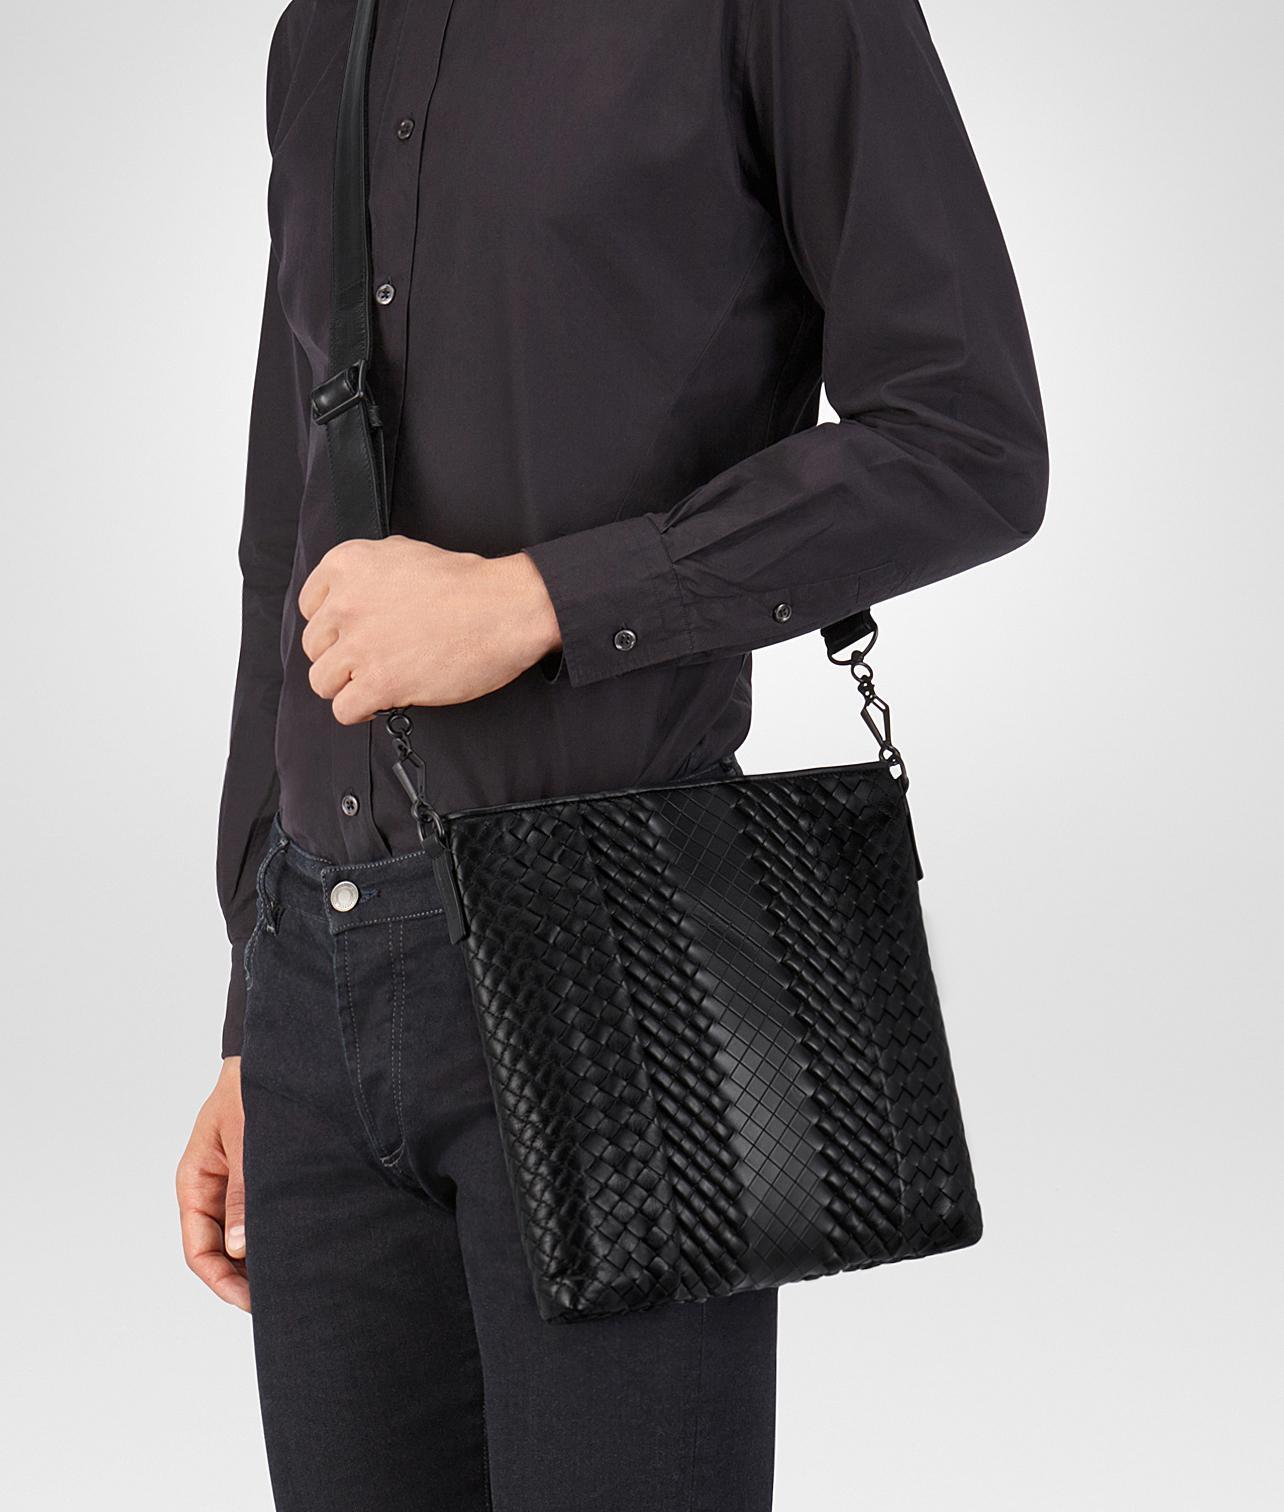 4ea8f45221 Lyst - Bottega Veneta Messenger Bag In Nero Intreccio Imperatore Calf in  Black for Men - Save 5%